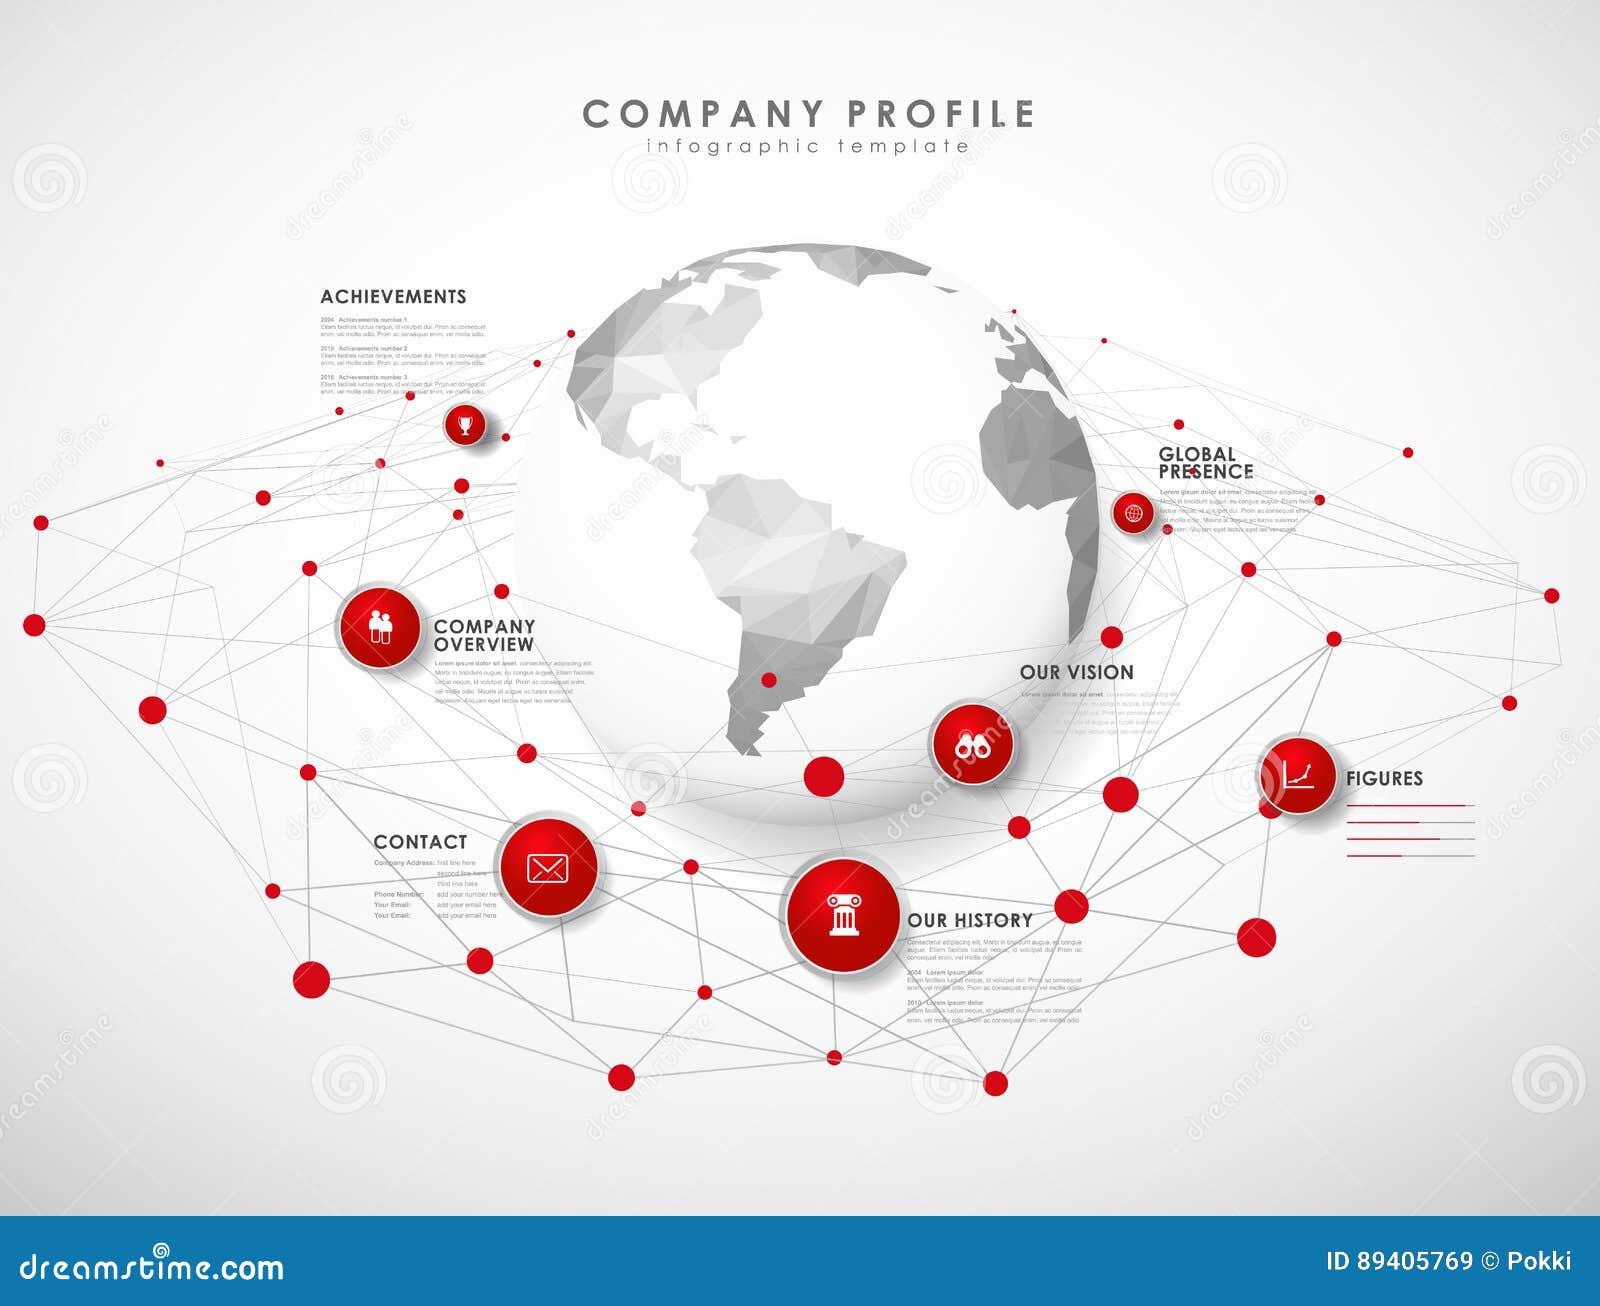 Molde da vista geral do perfil da empresa